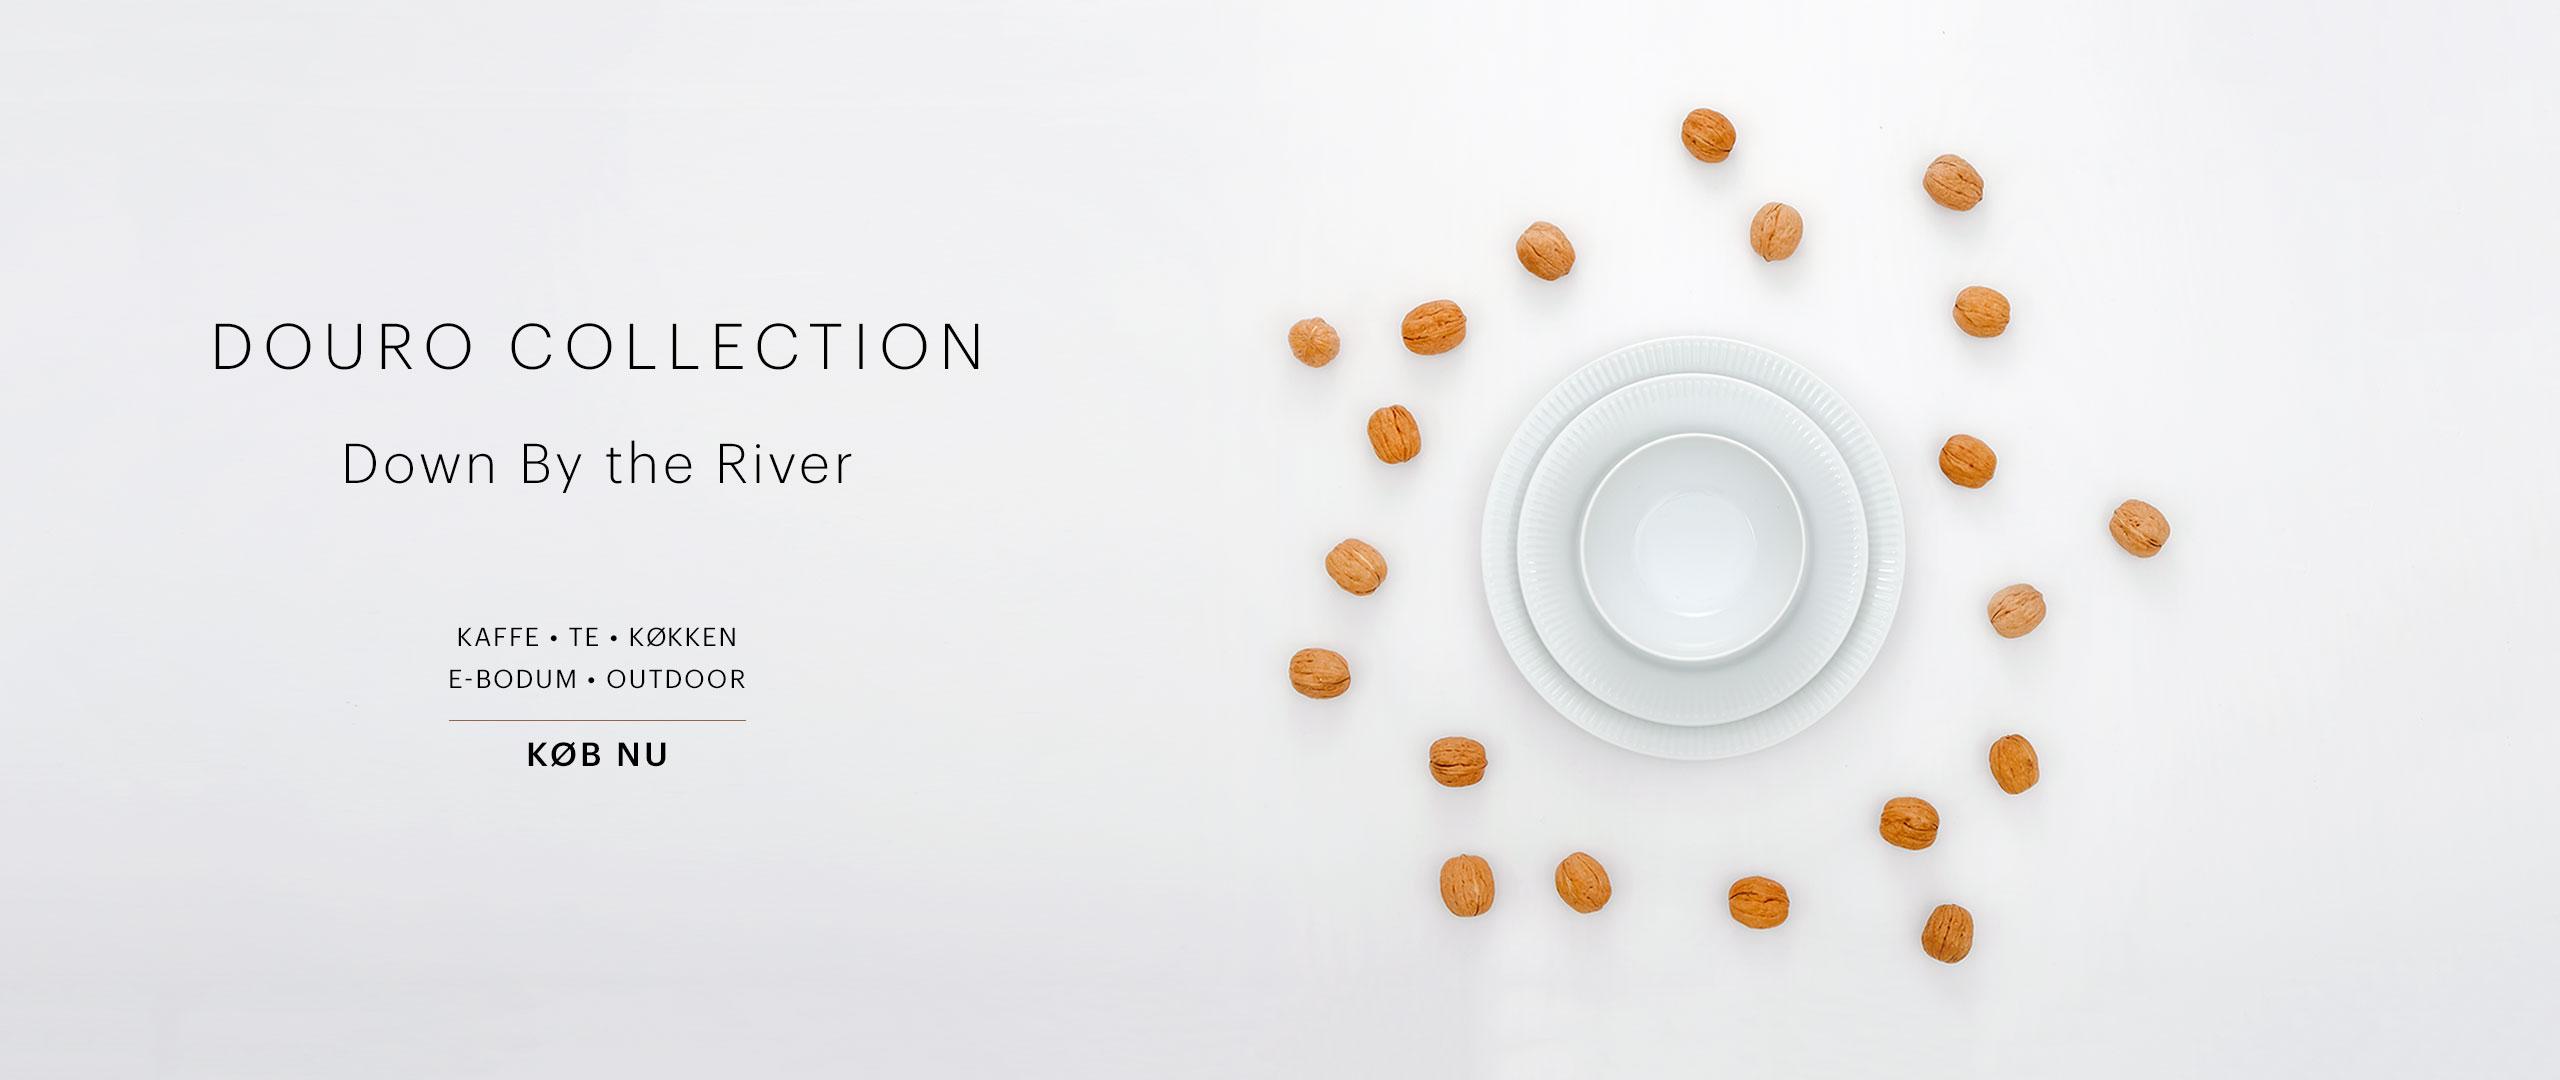 BEU - [DK] - Douro Collection